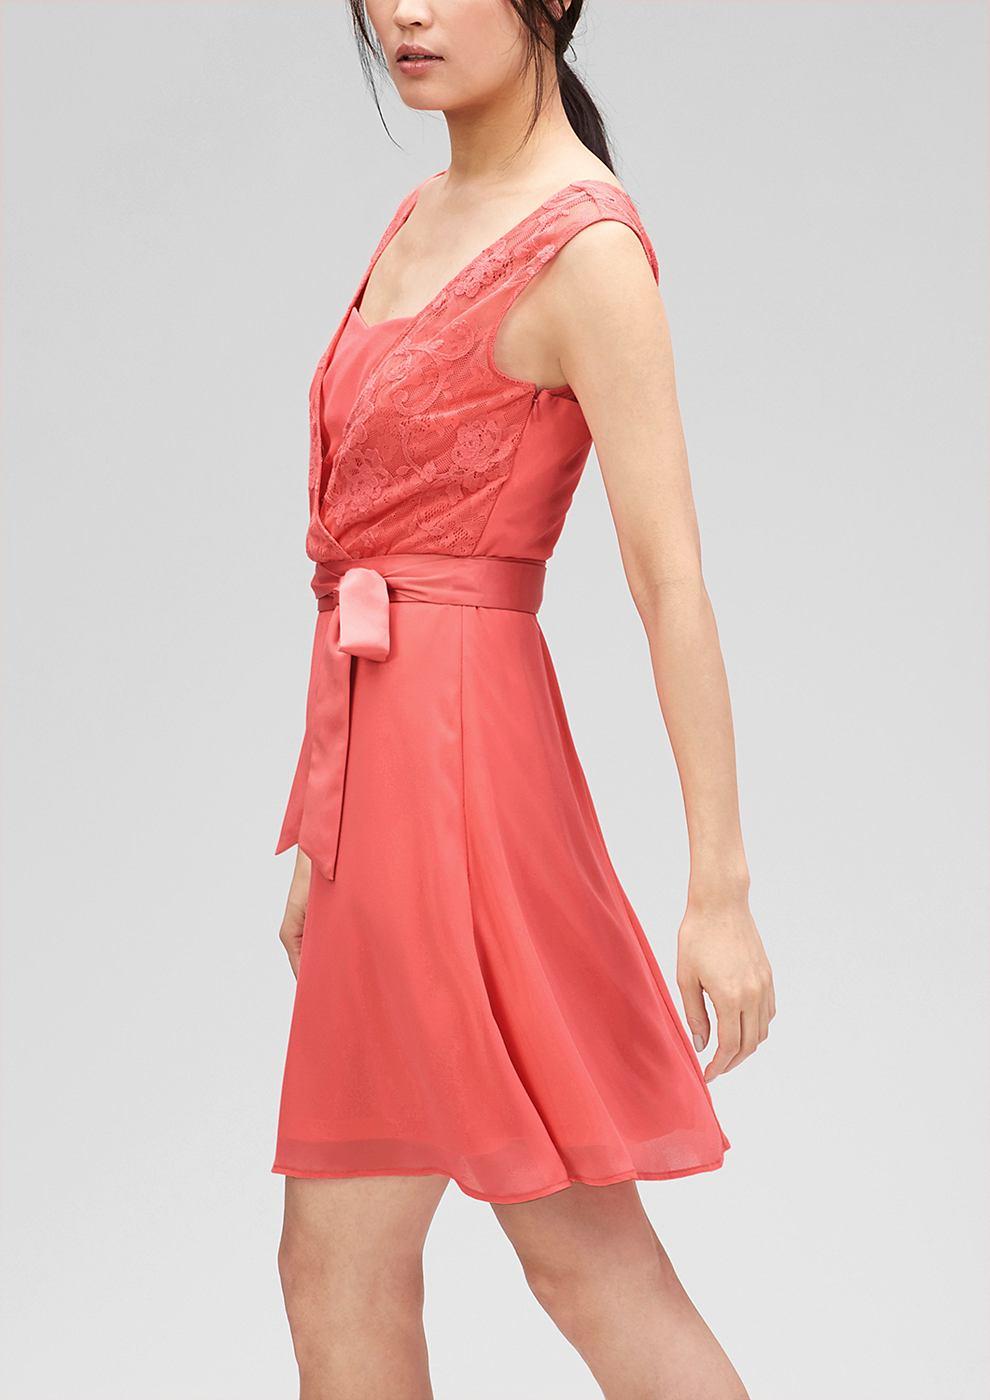 s.Oliver Premium jurk met kant en laagjeseffect rood